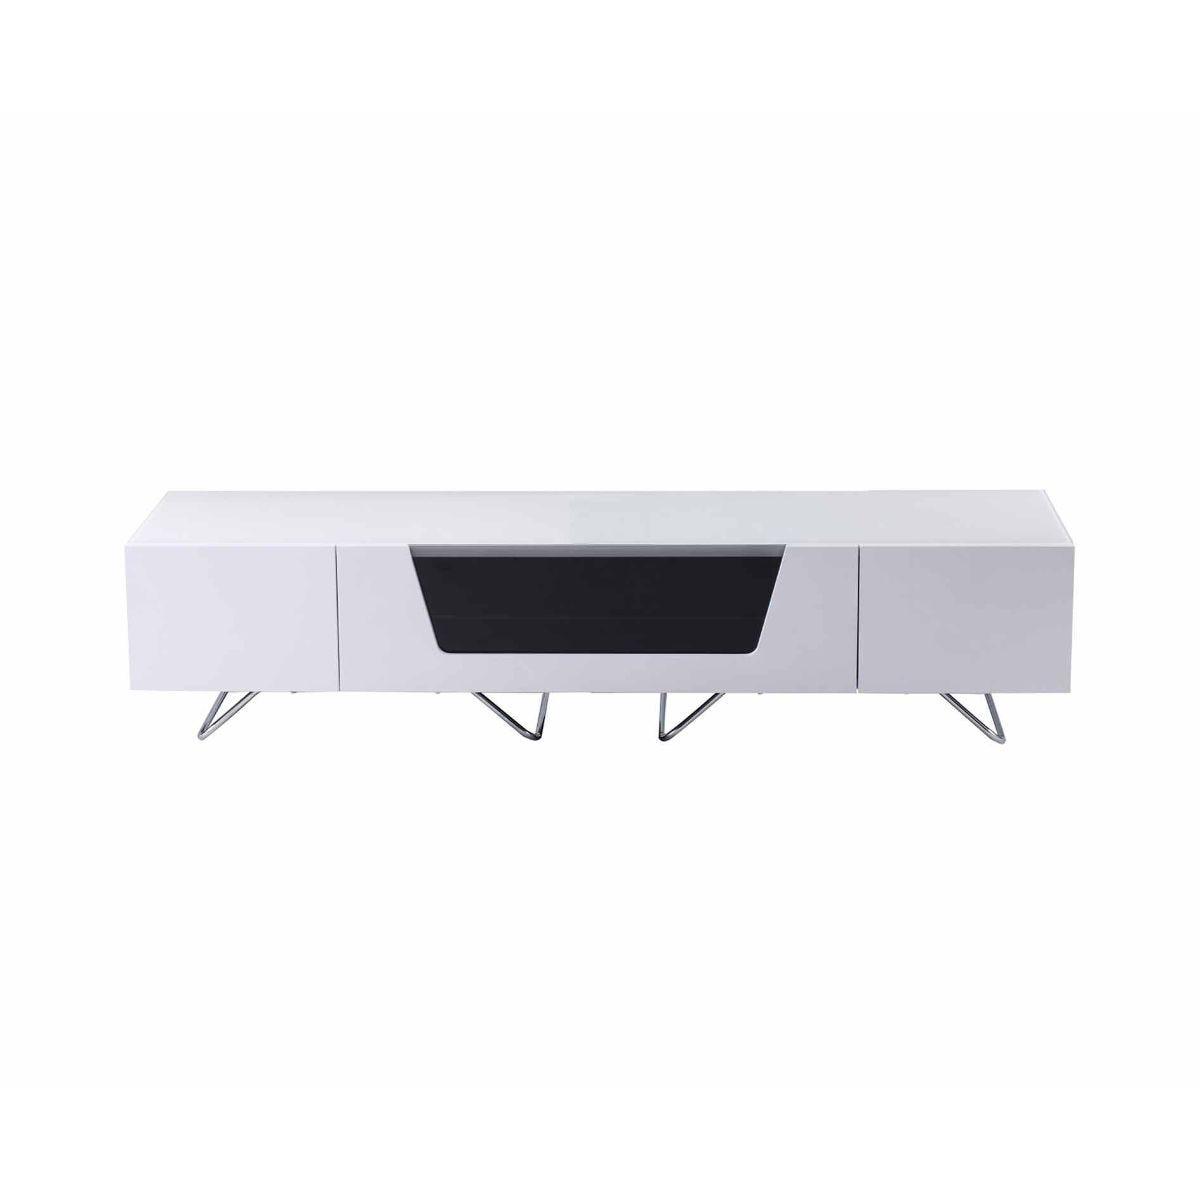 Alphason Chromium 1600 TV Cabinet, White